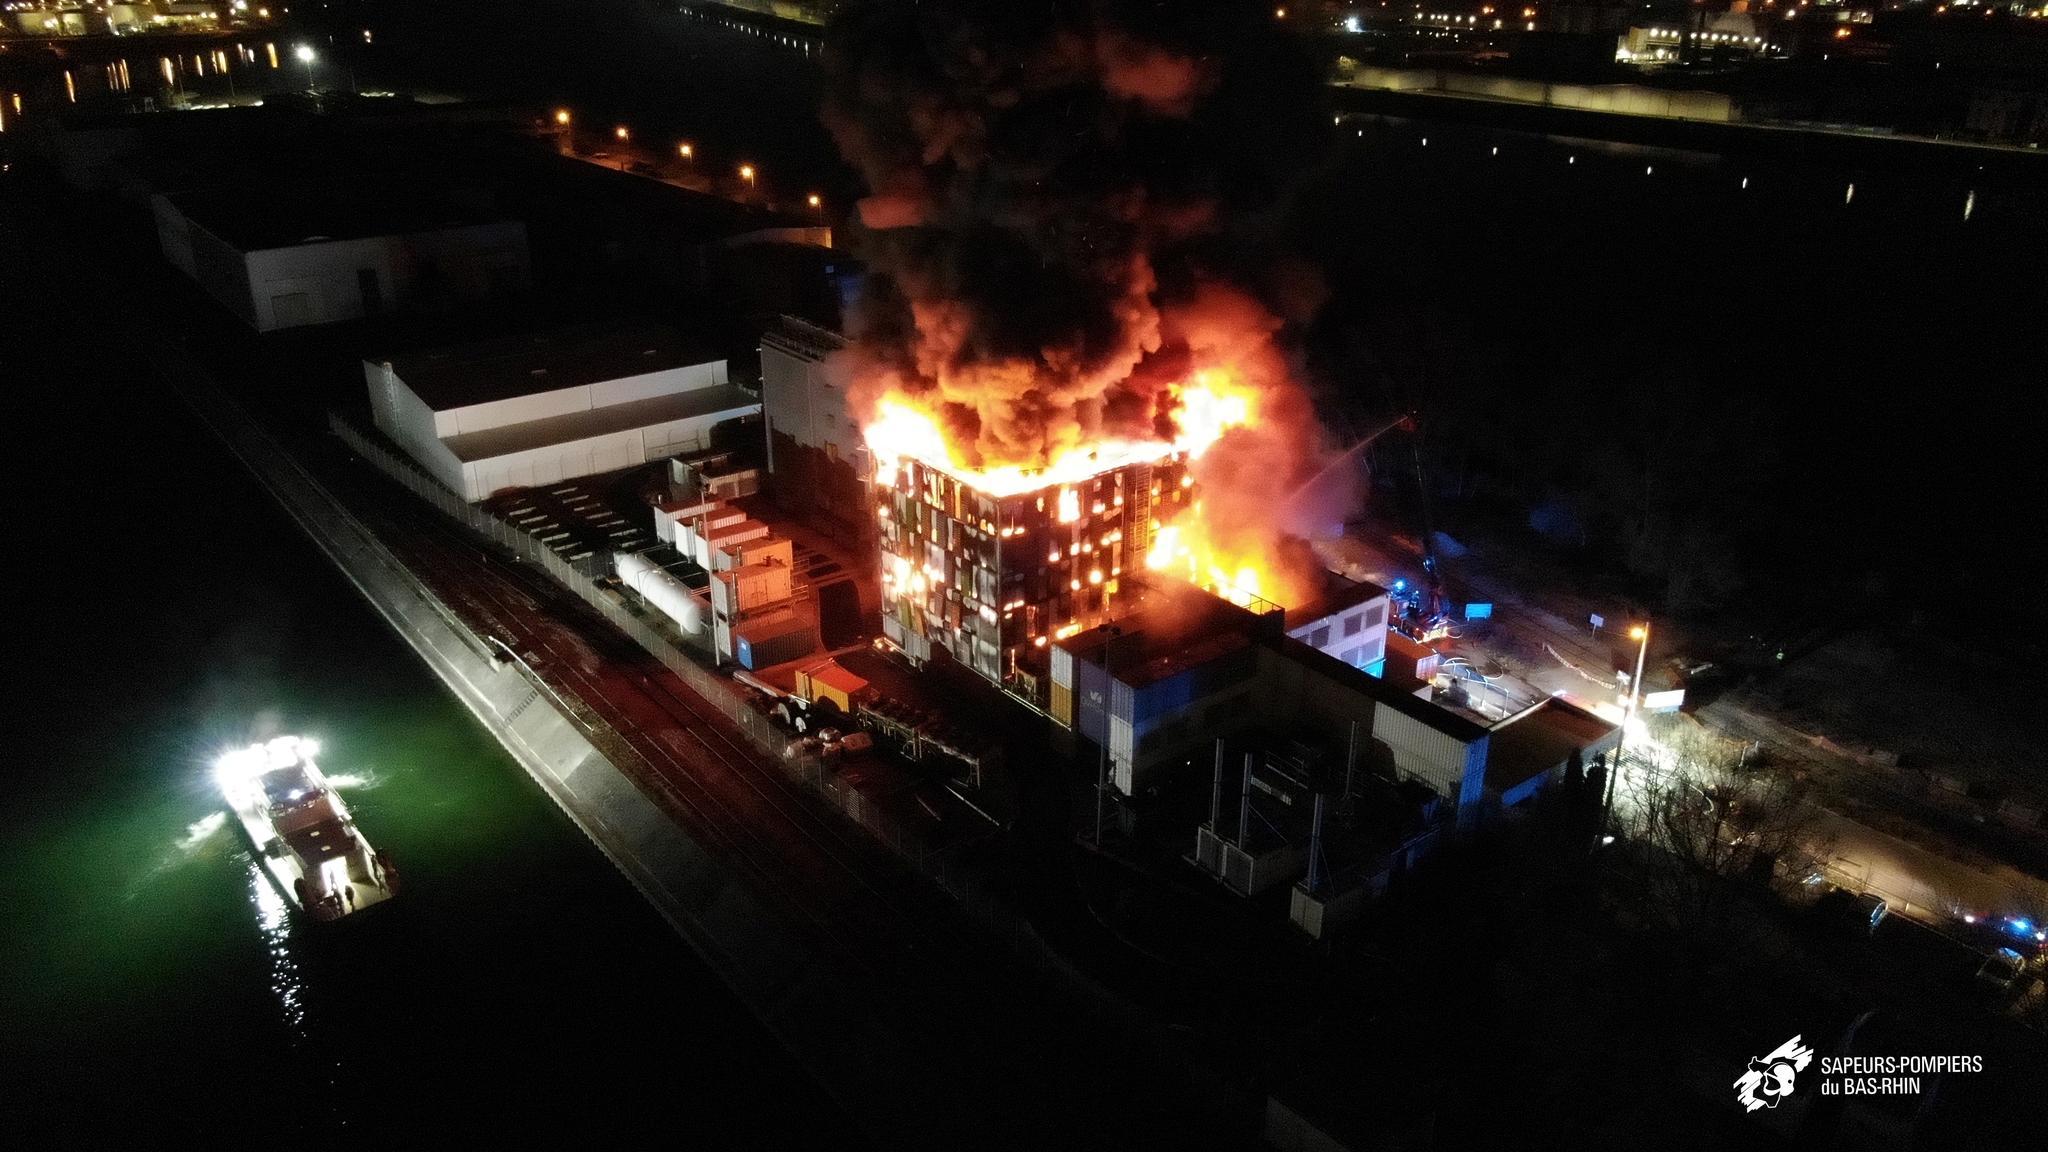 OVH Data Center Fire in Europe